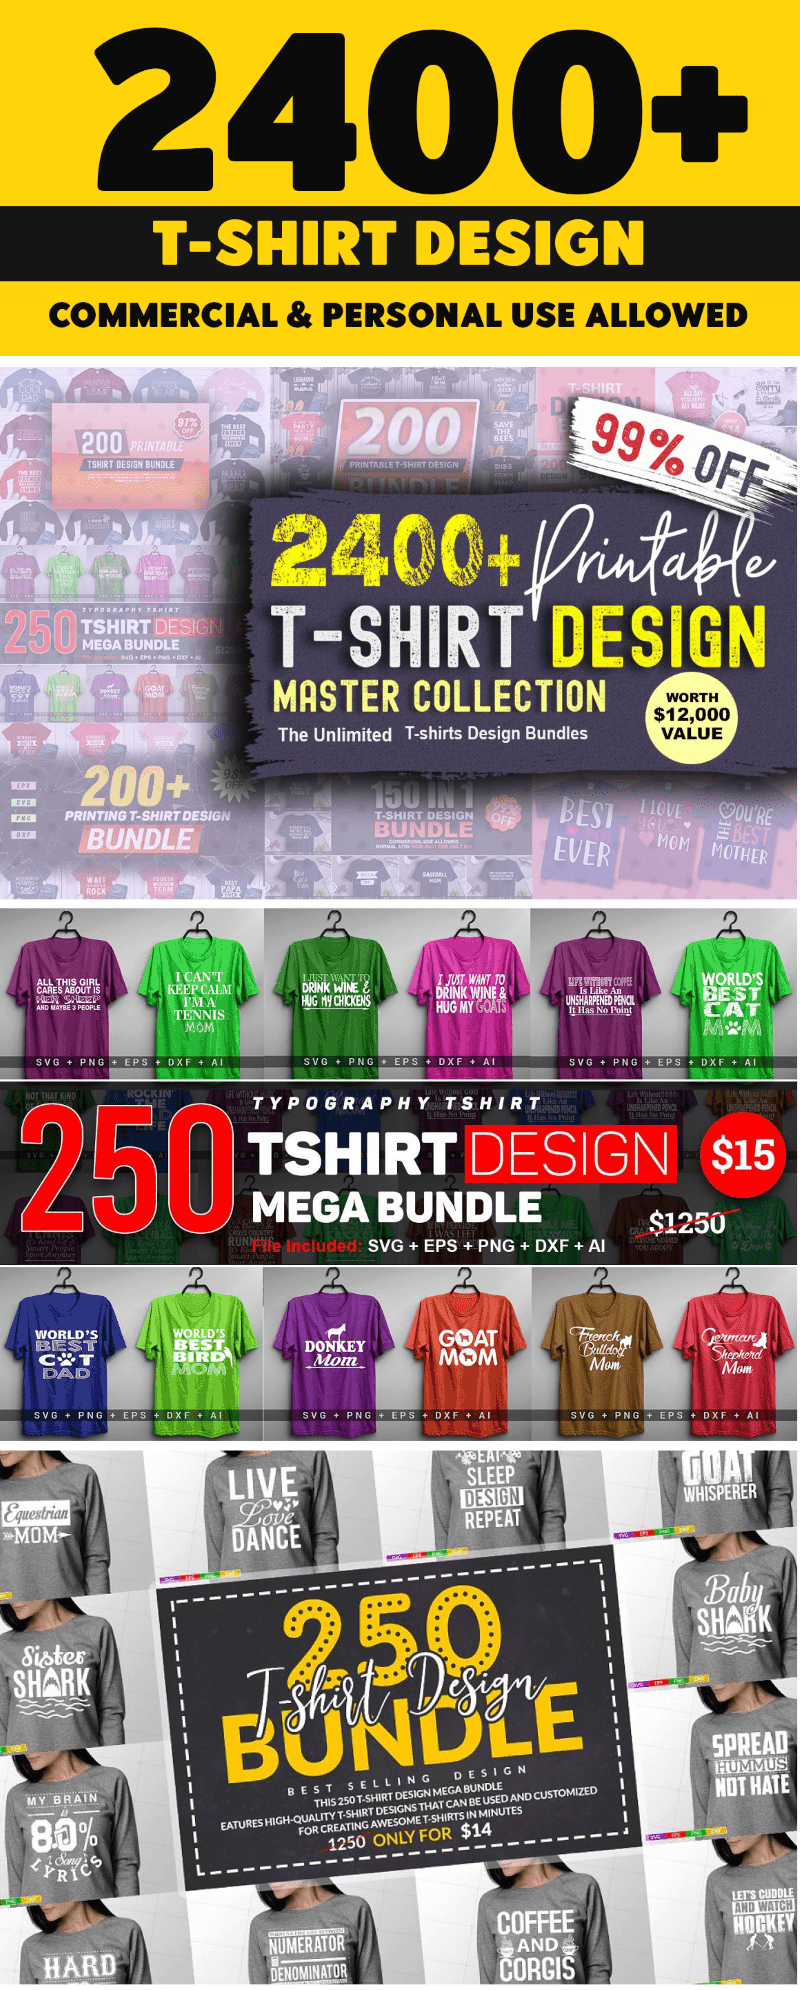 t-shirt designs, ps actions, svg designs